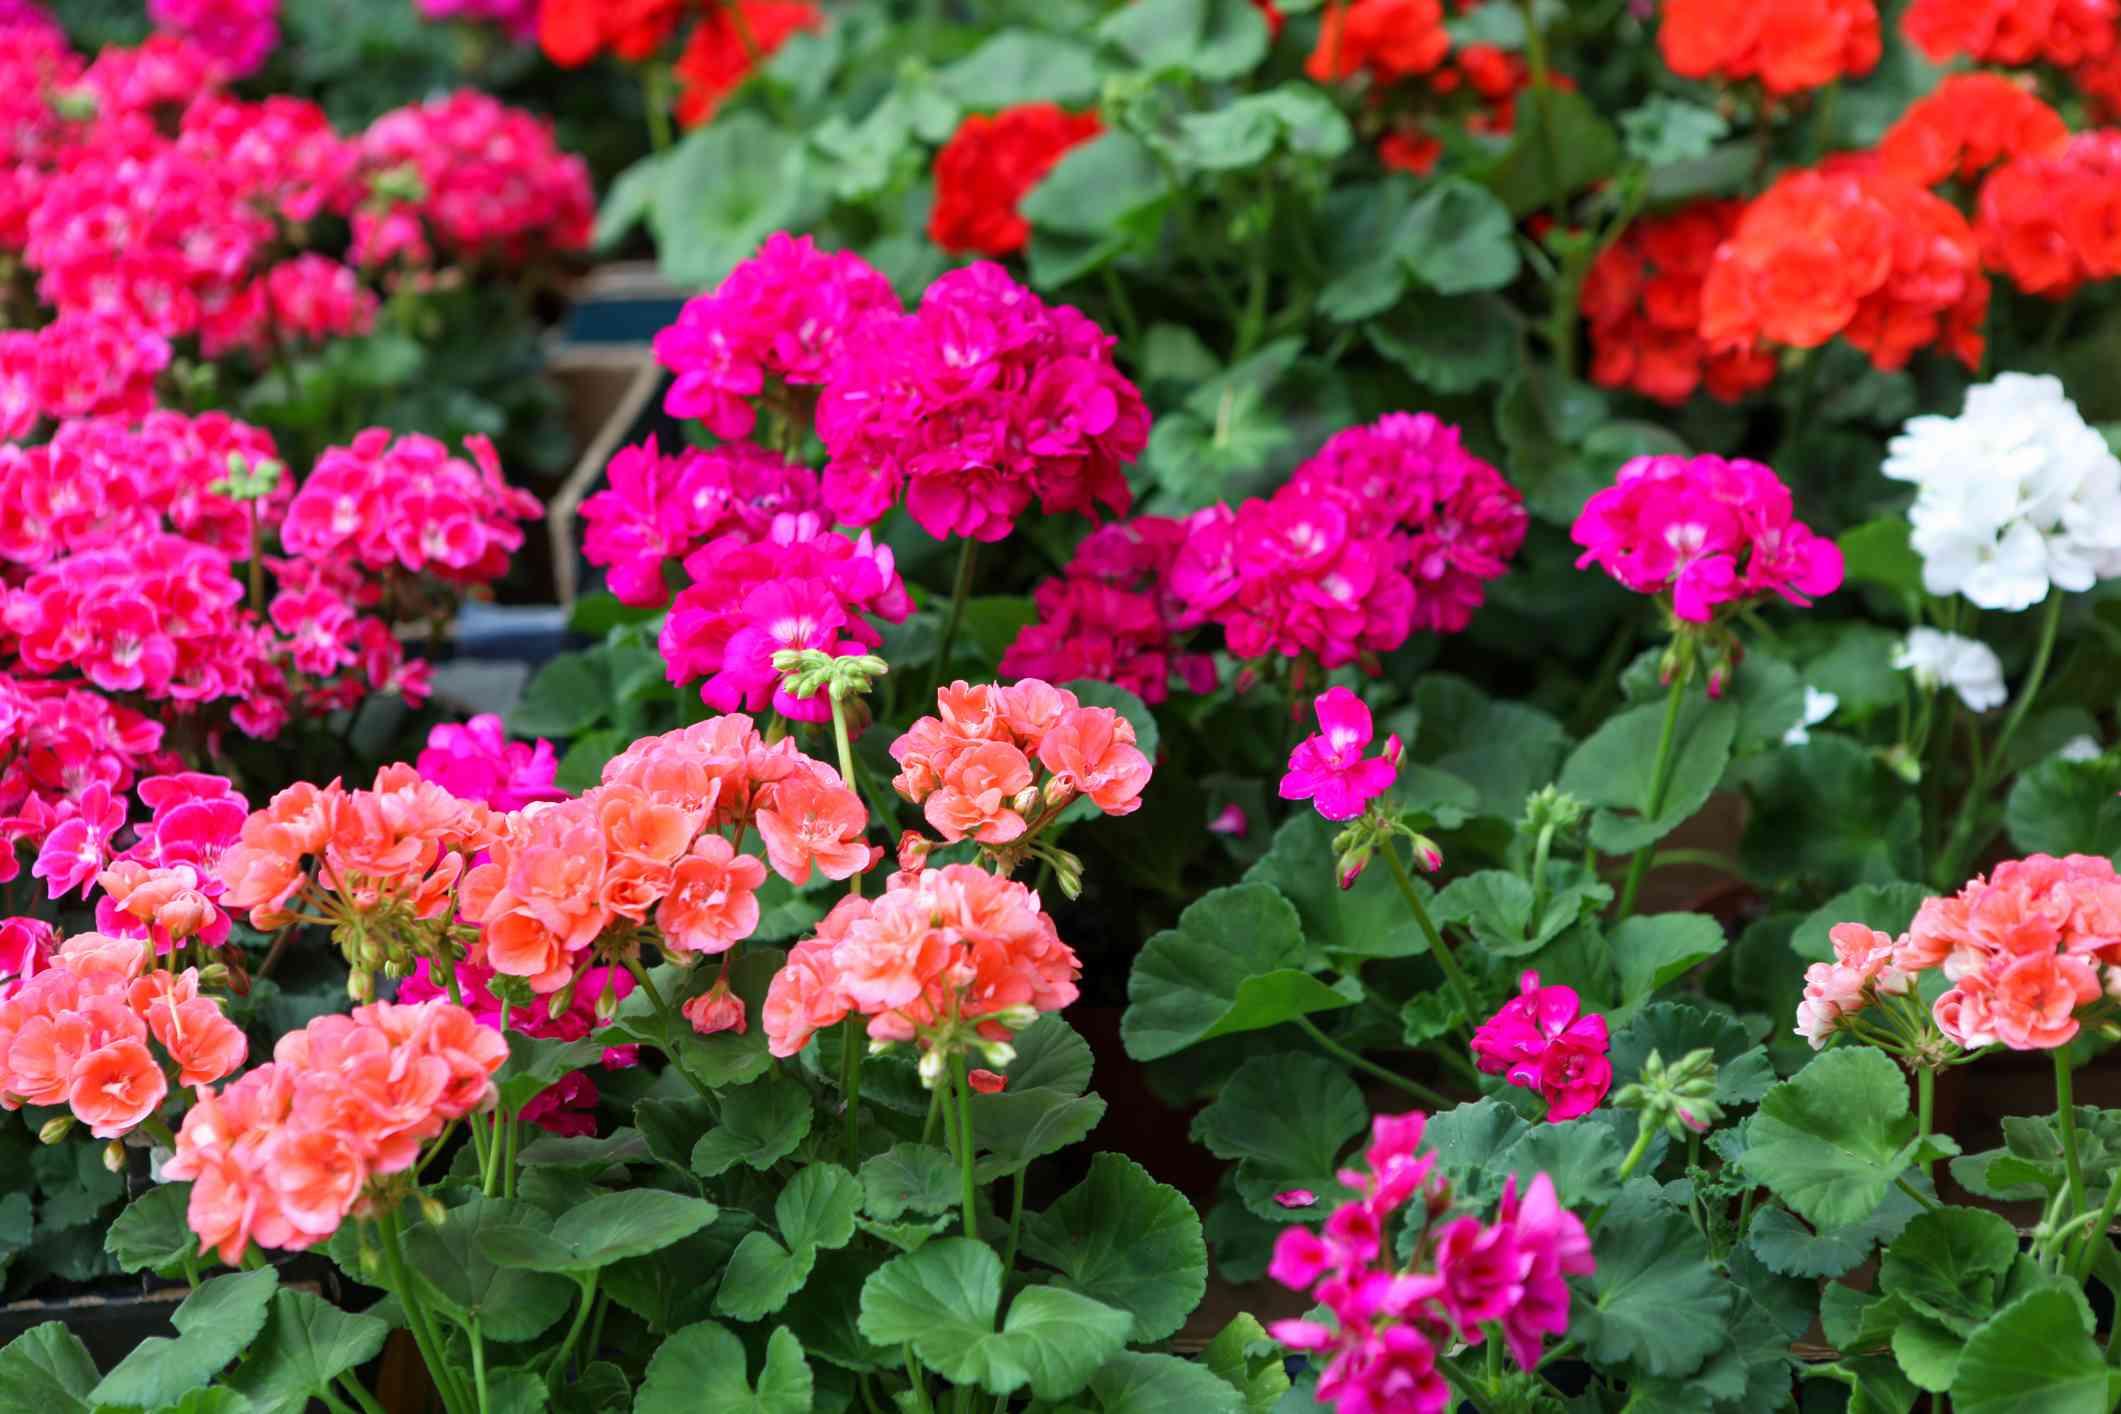 Close up of geranium flowers